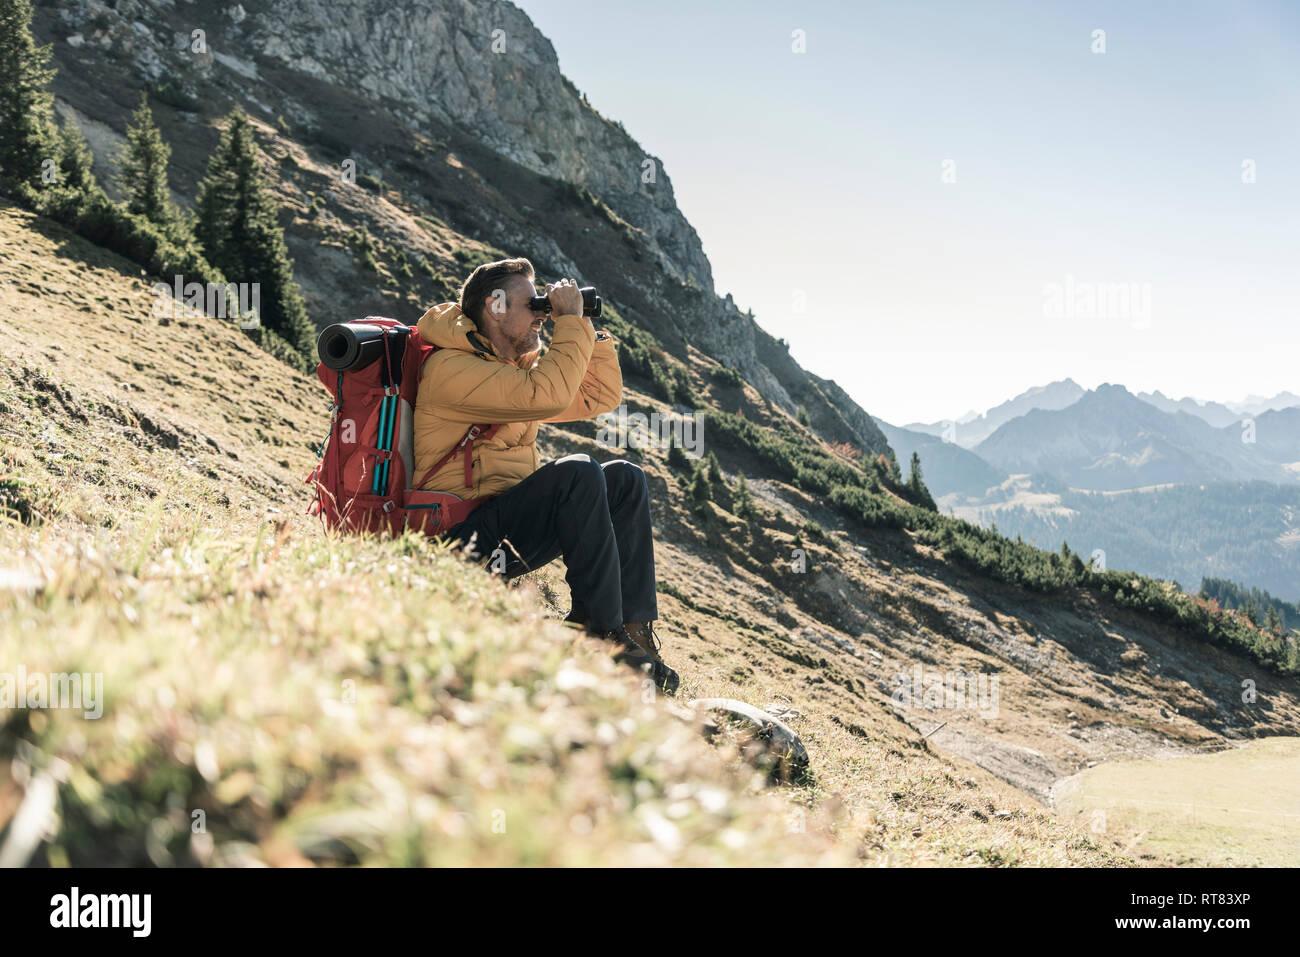 Austria, Tyrol, man having a break during a hiking trip in the mountains looking through binoculars Stock Photo